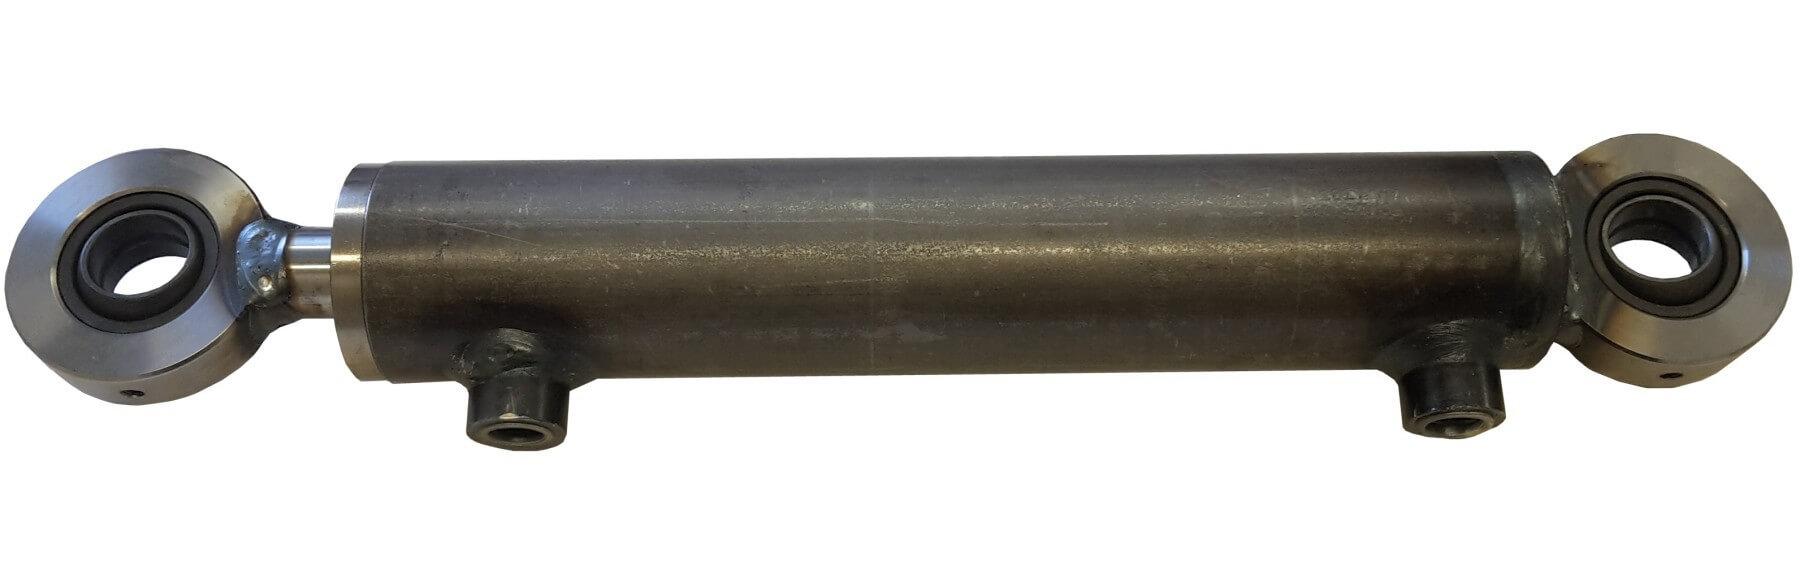 Hydraulisylinteri CL 40. 20. 350 GE